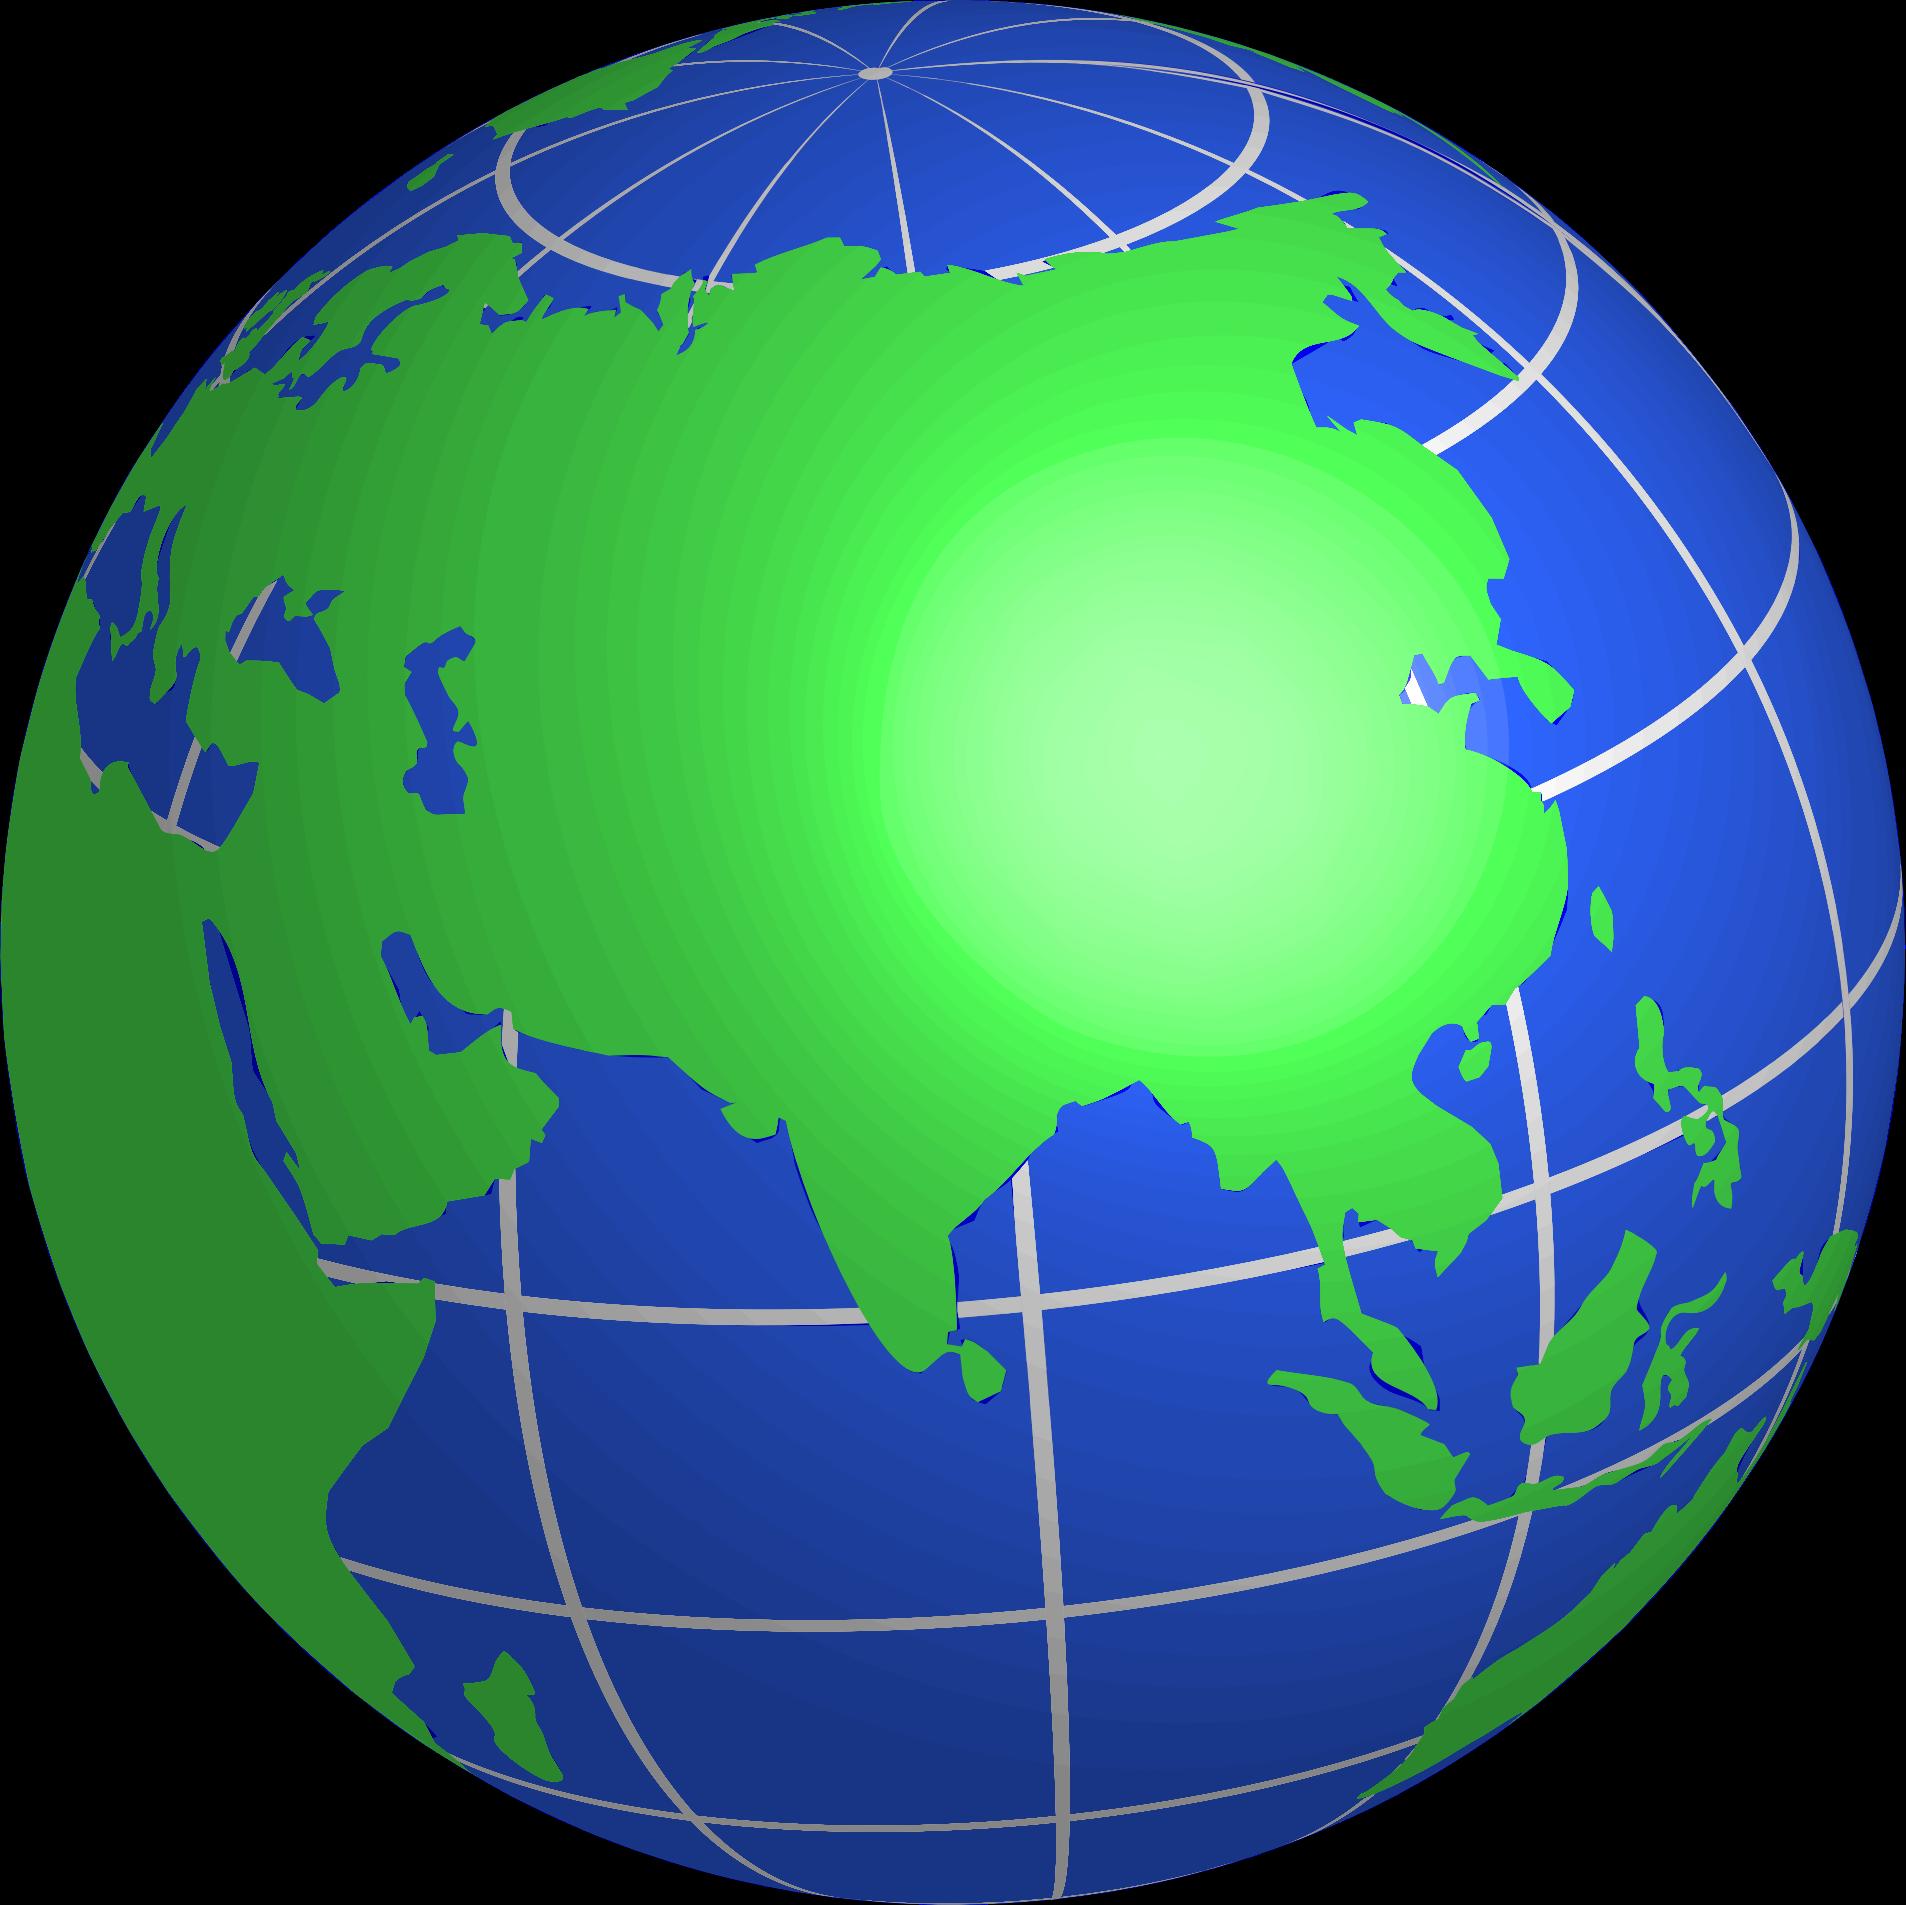 Clipart globe current event. Asia